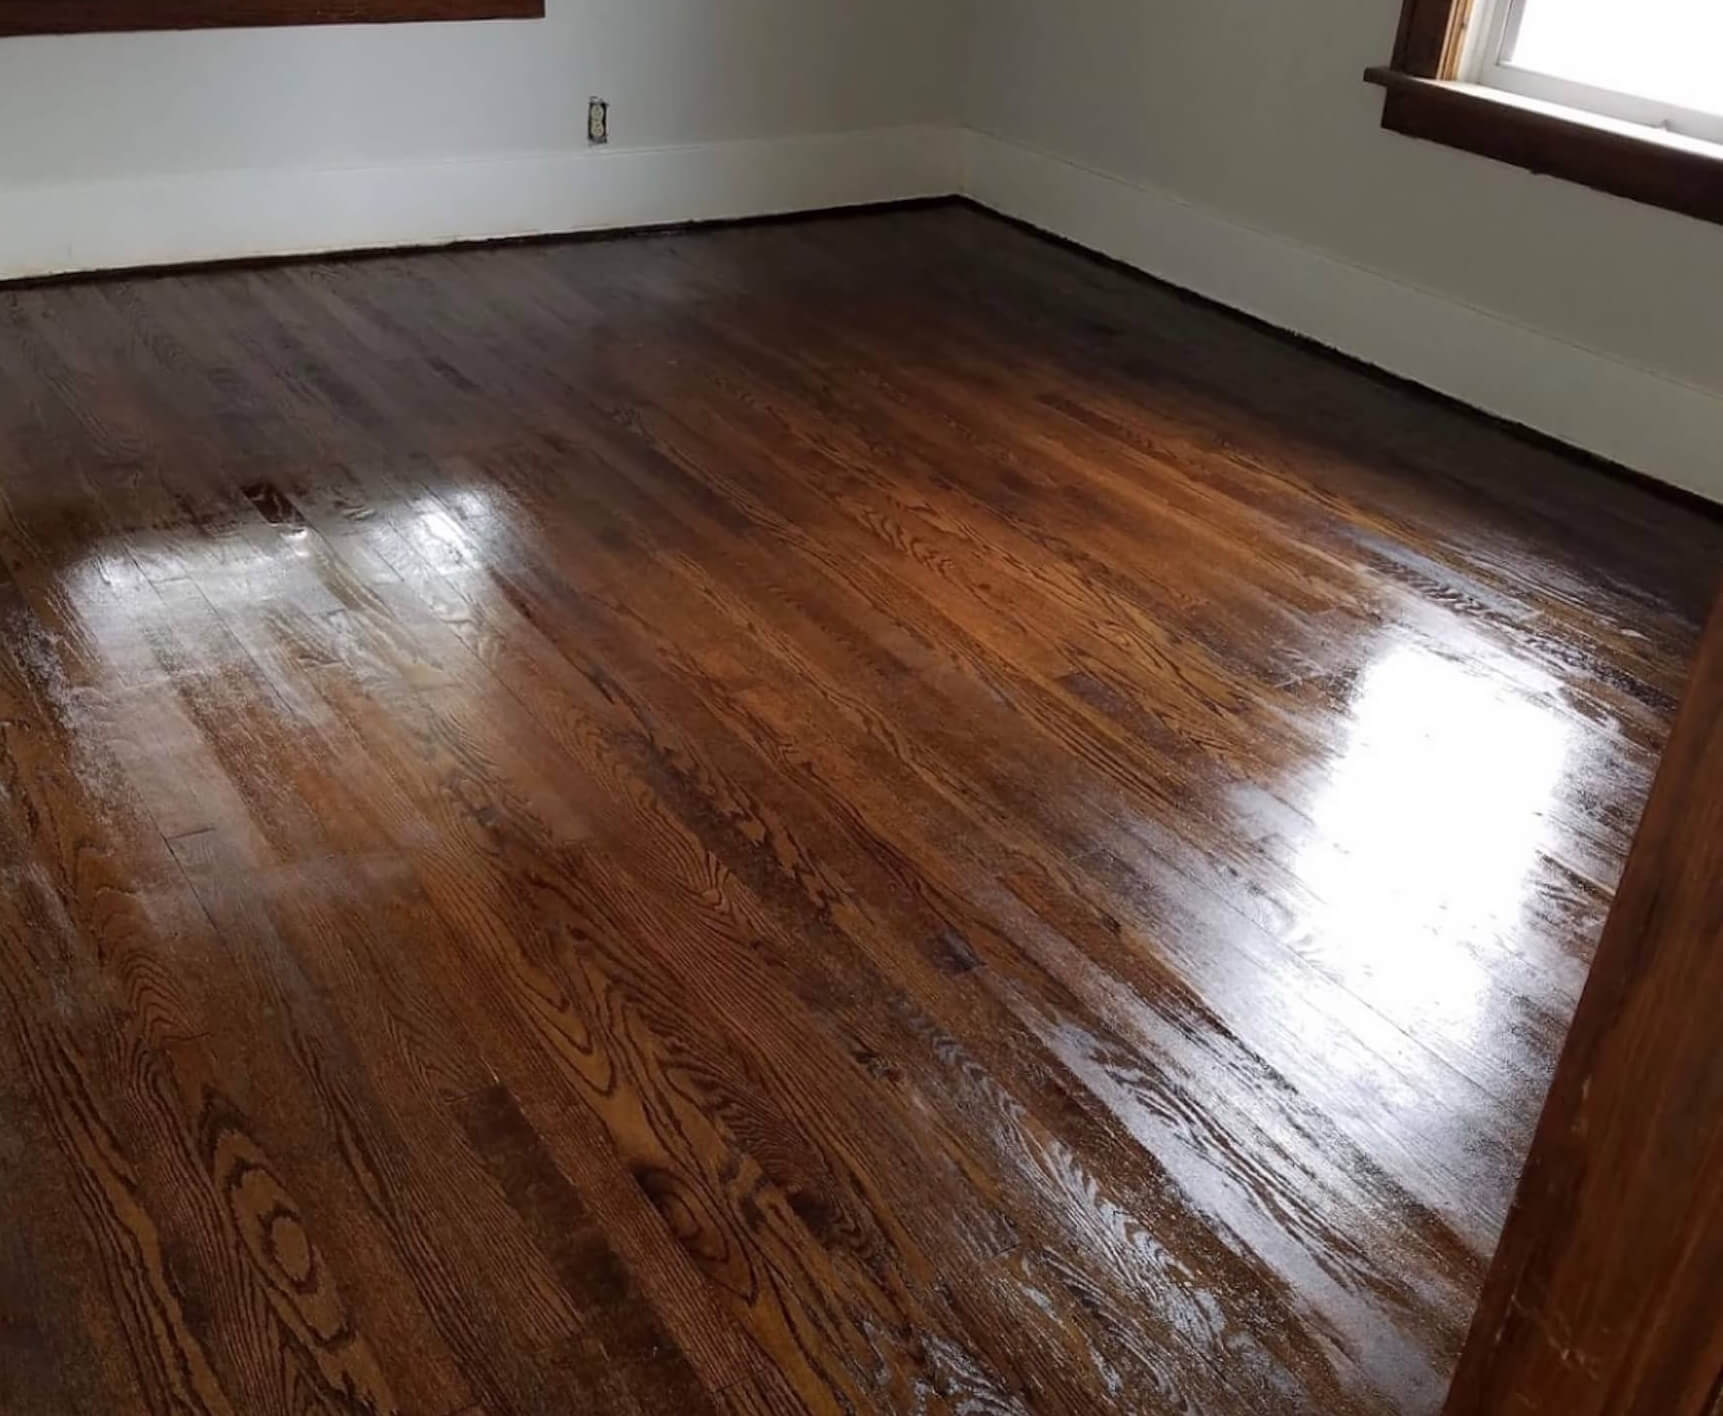 hardwood floor refinishing in dublin, oh